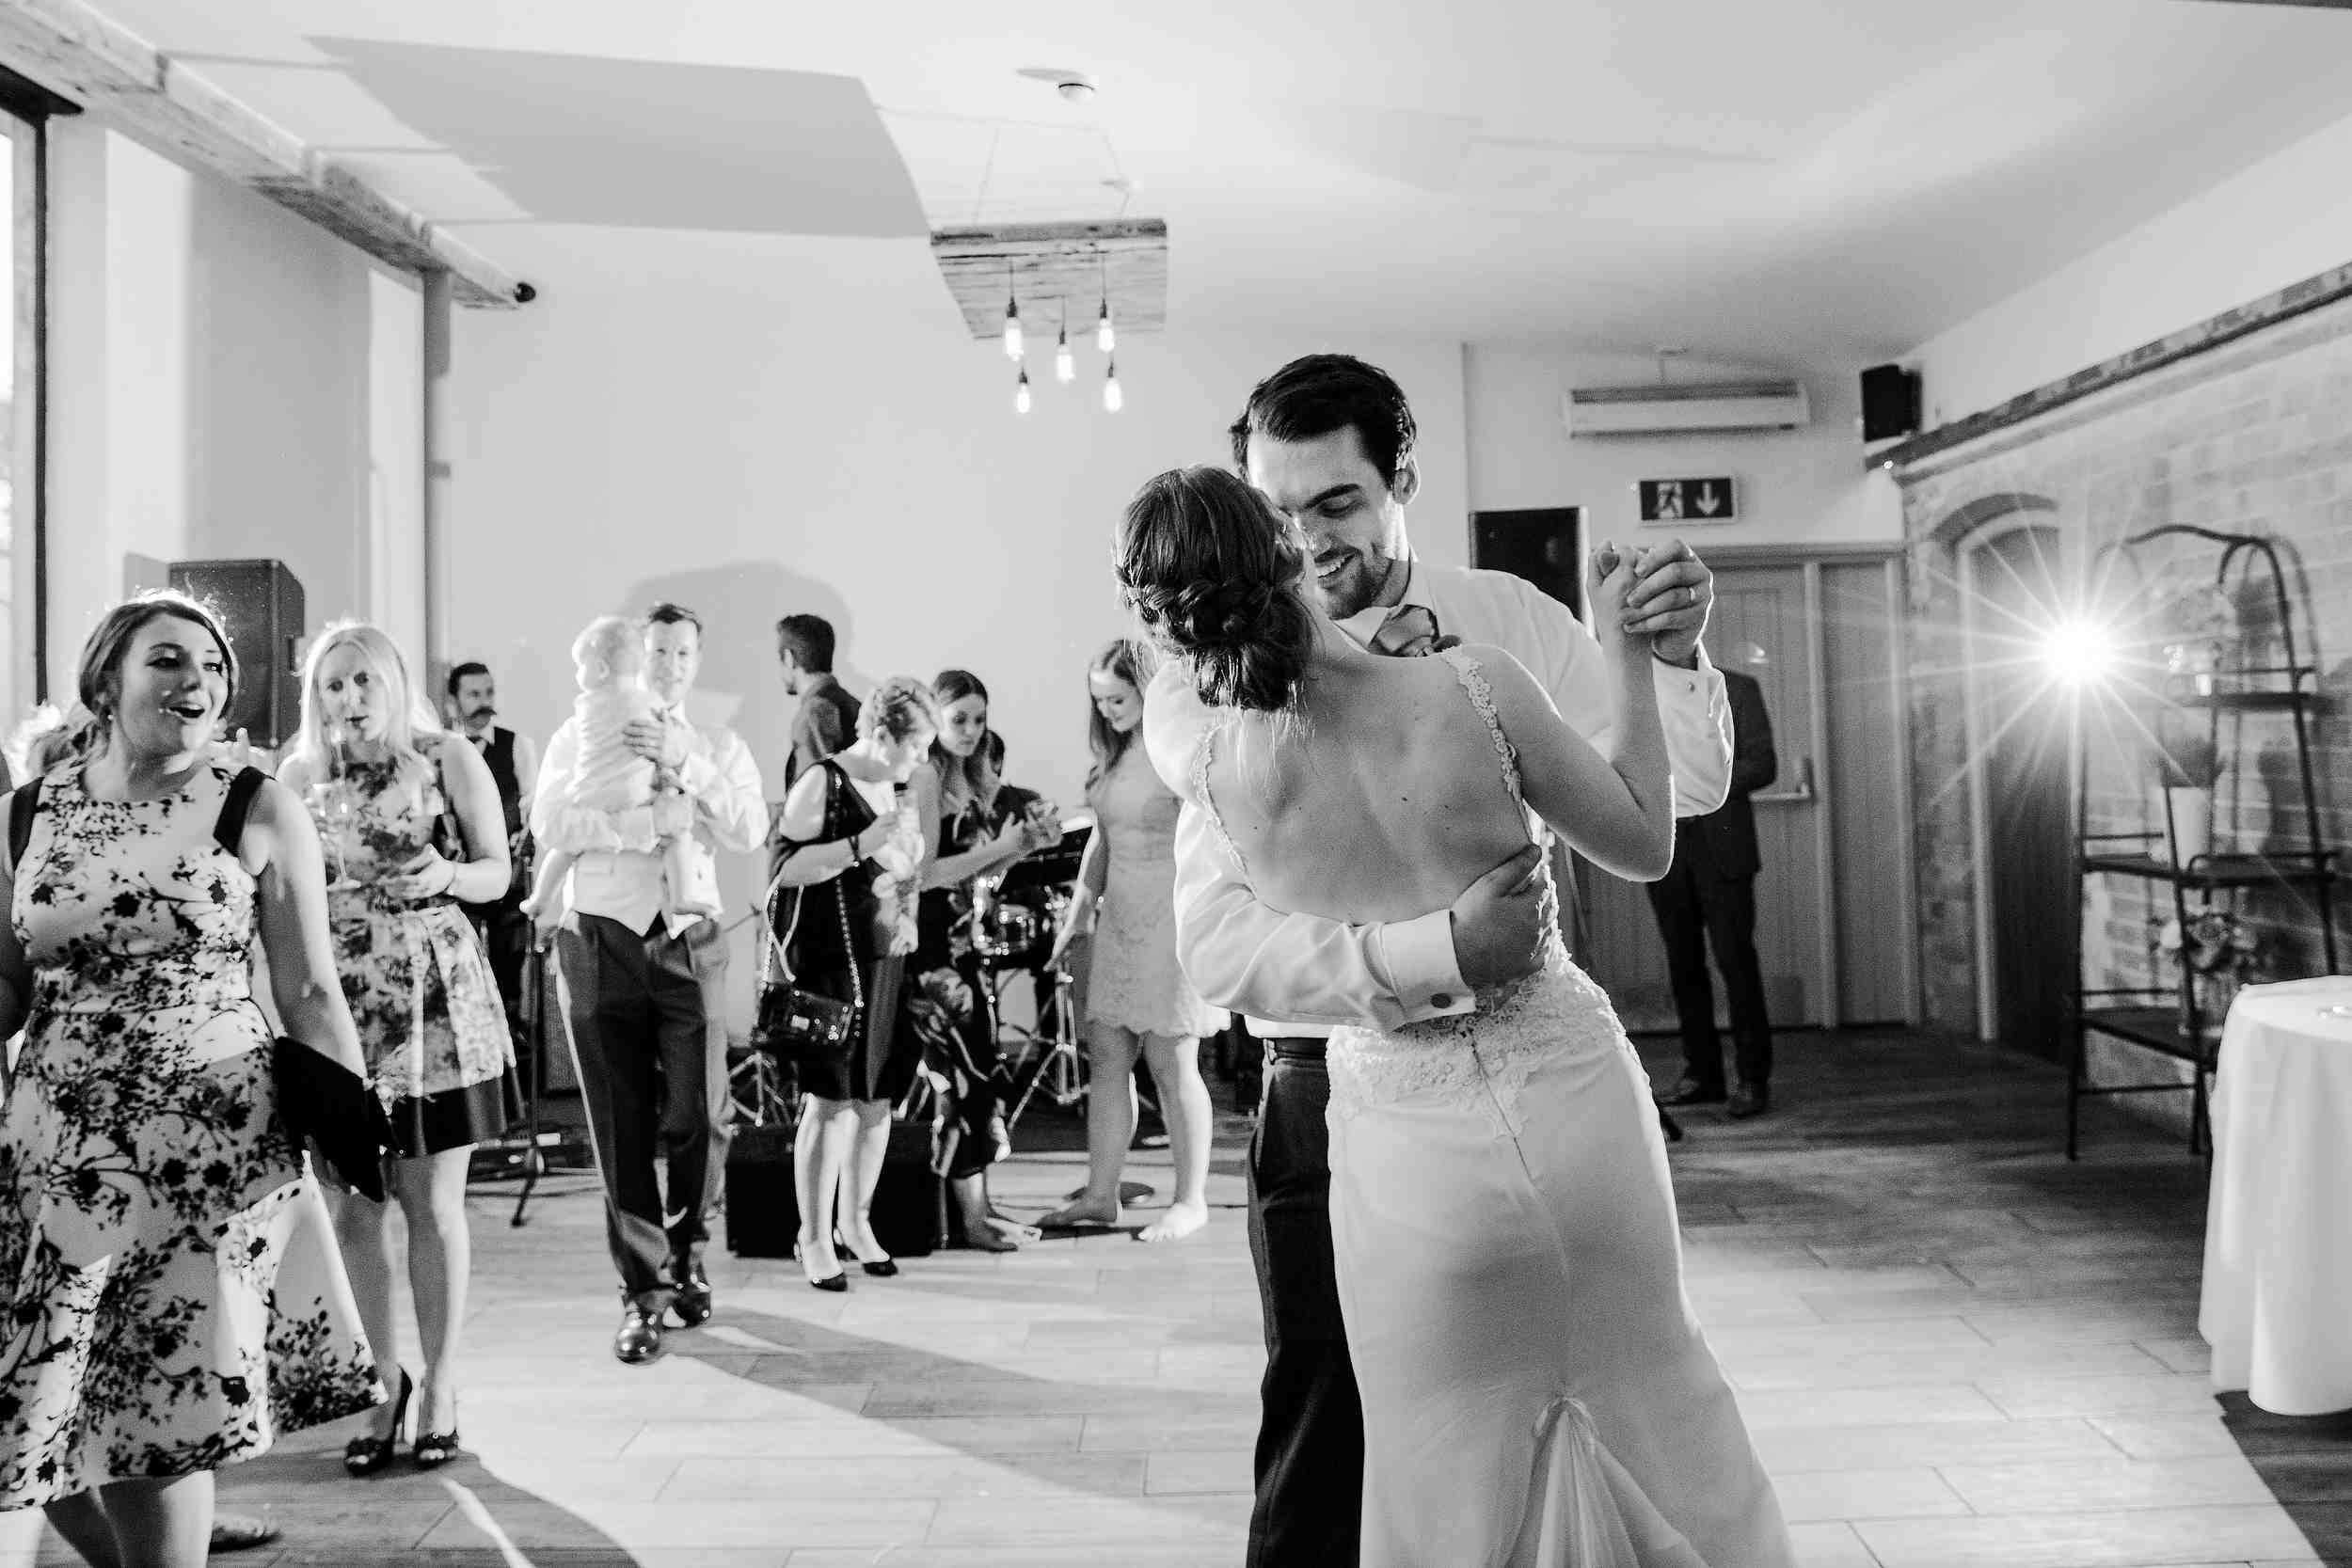 Modern_Stylish_Wedding_at_Swallows_Nest_Barn1304